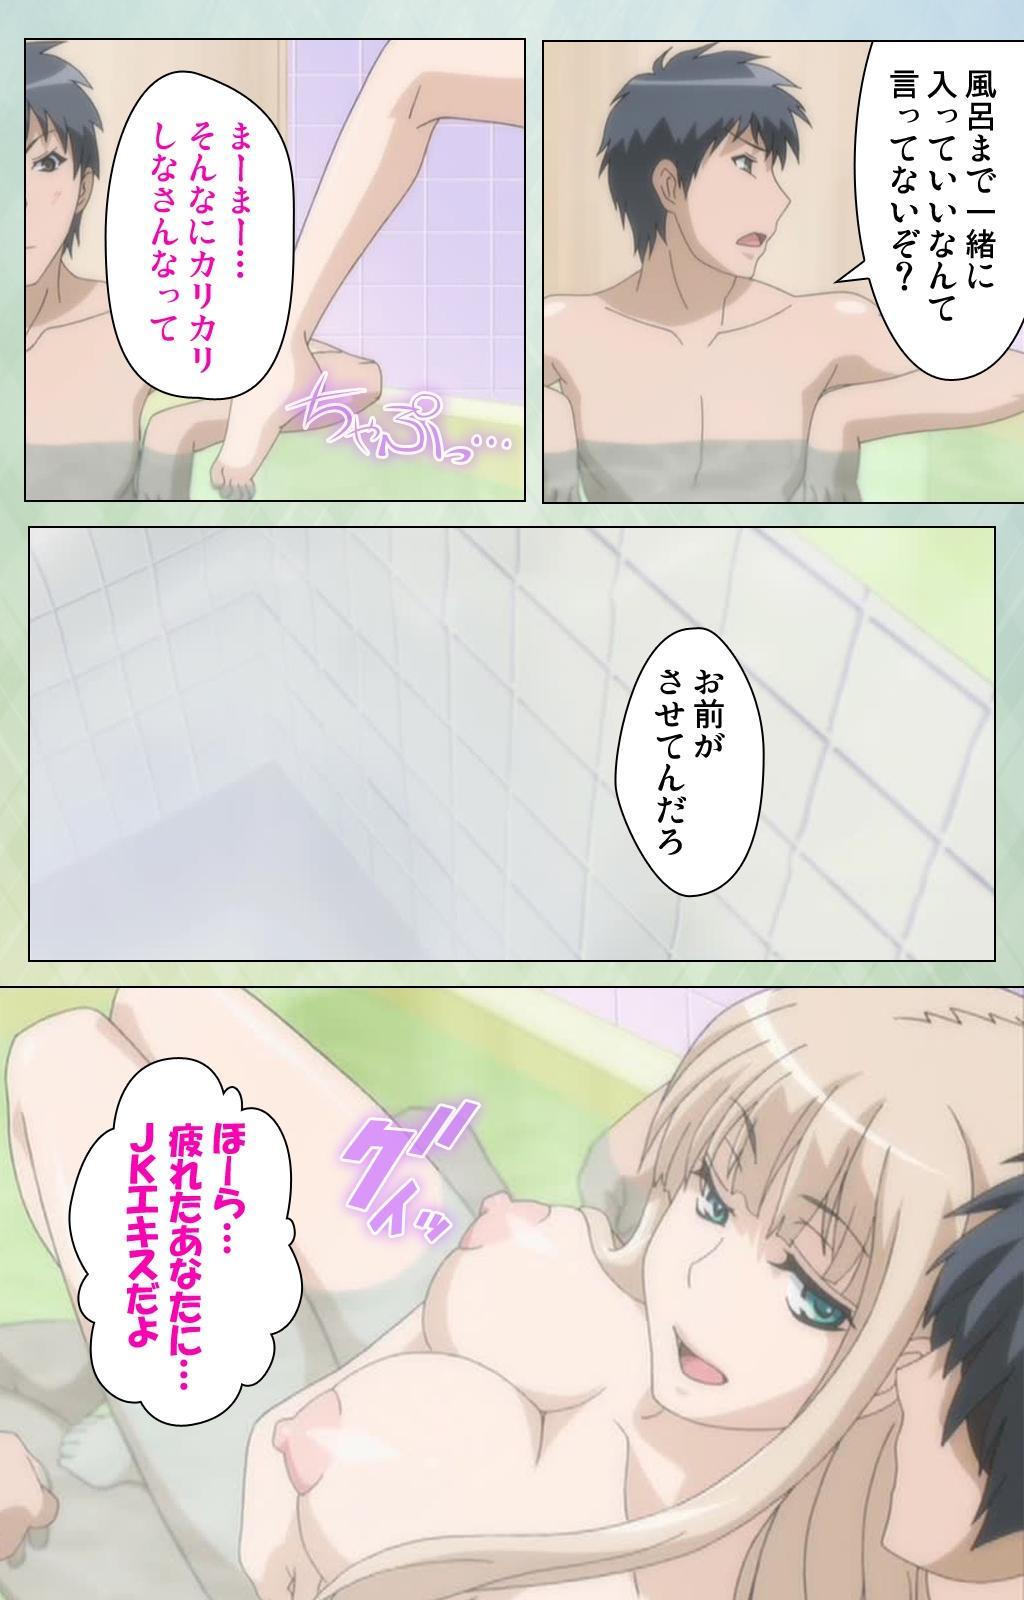 Furueru Kuchibiru fuzzy lips0 Complete Ban 48